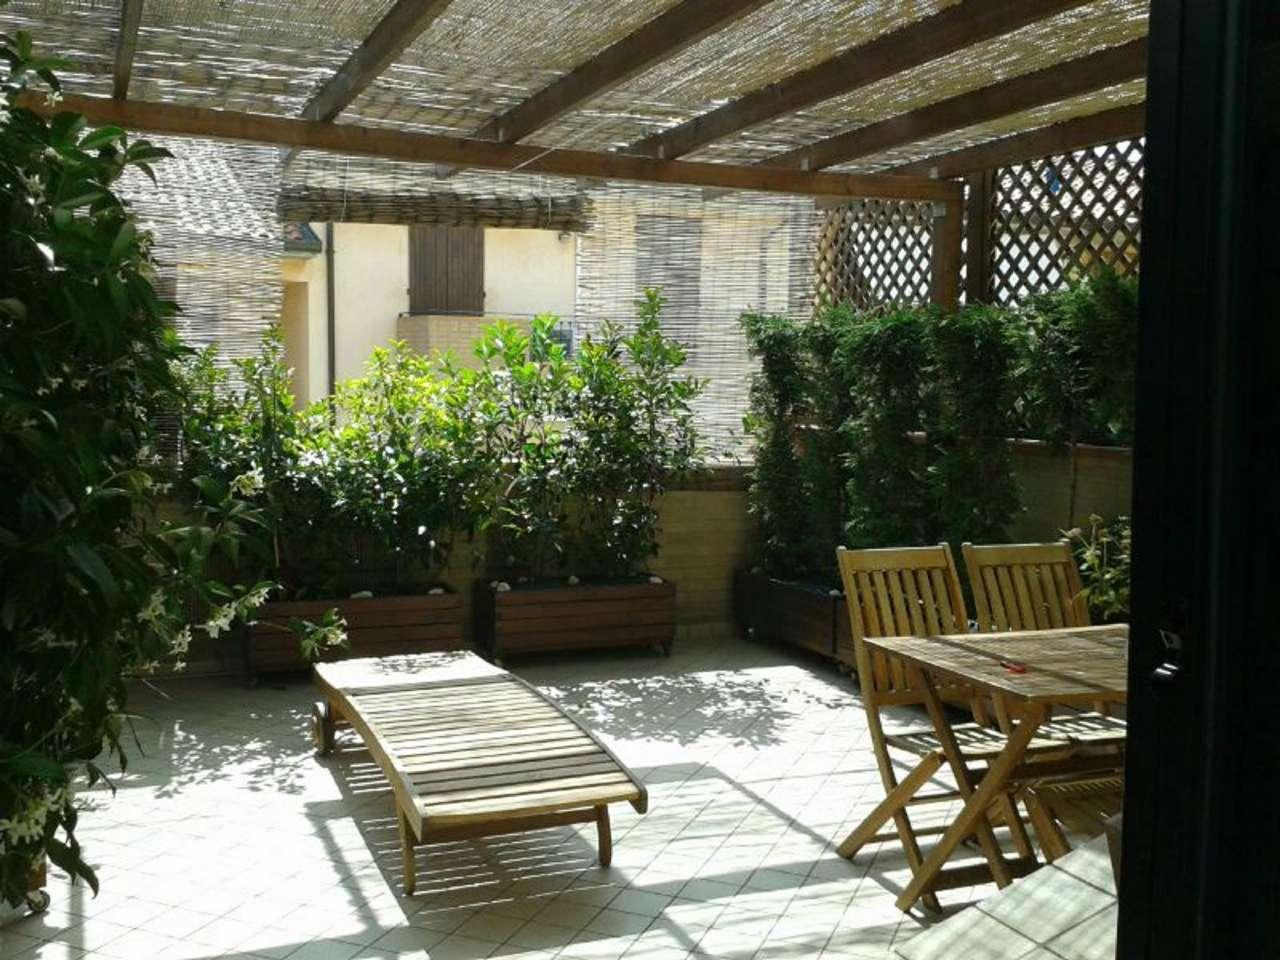 Cerco casa ravenna ra appartamento in vendita a ravenna - Cerco piscina fuori terra ...